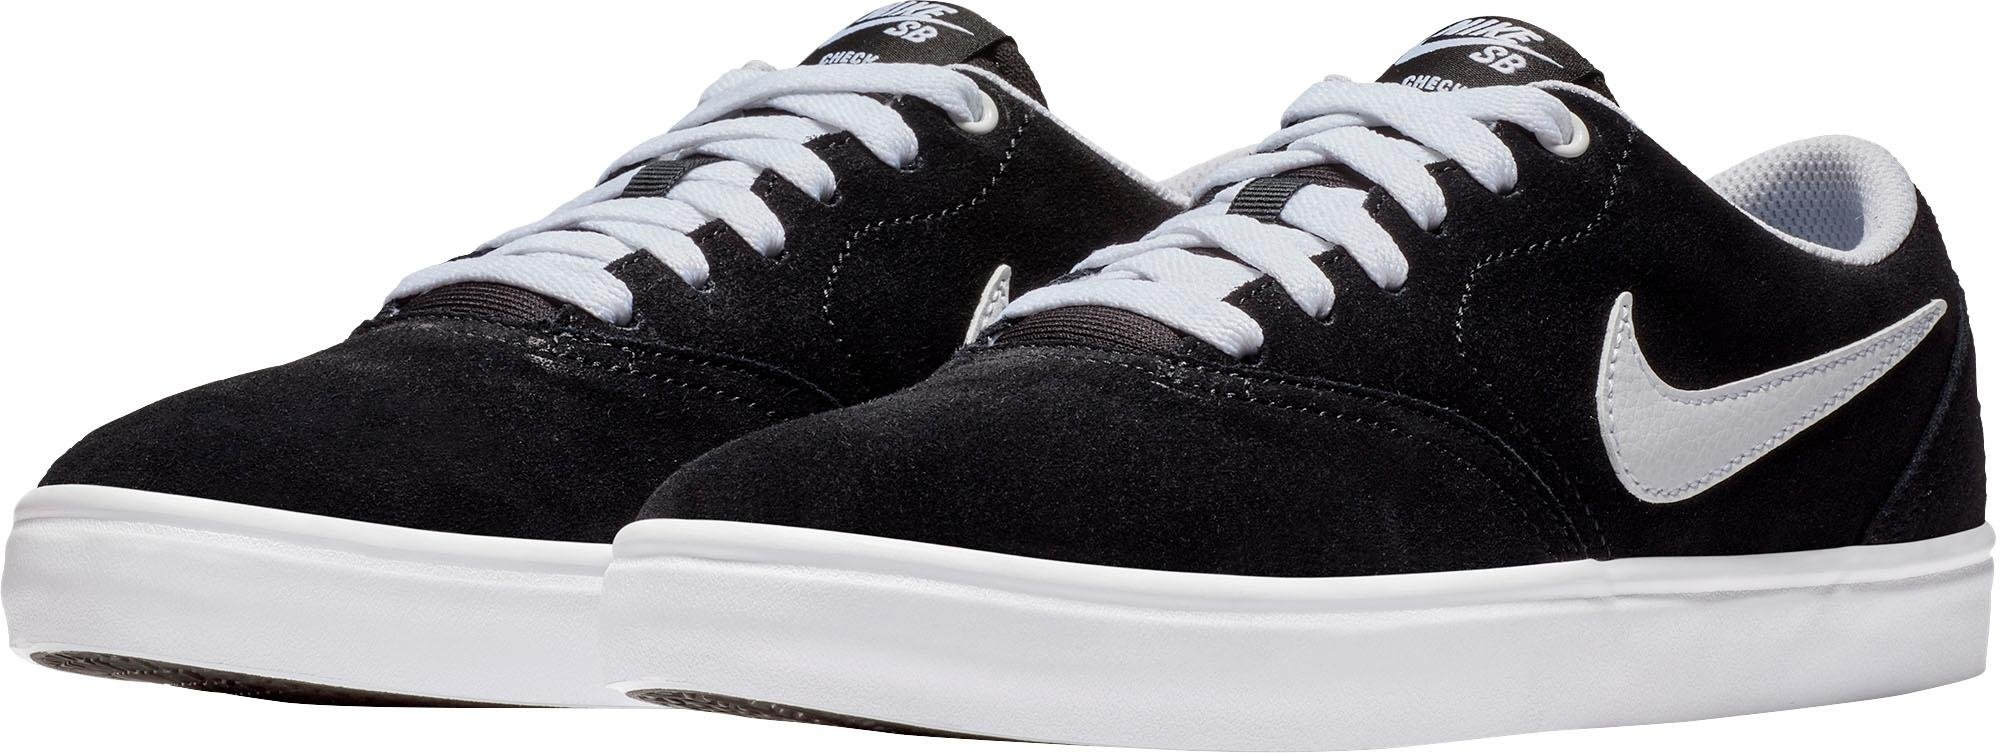 Nike Sb sneakers »Wmns SB Check Solar« goedkoop op otto.nl kopen